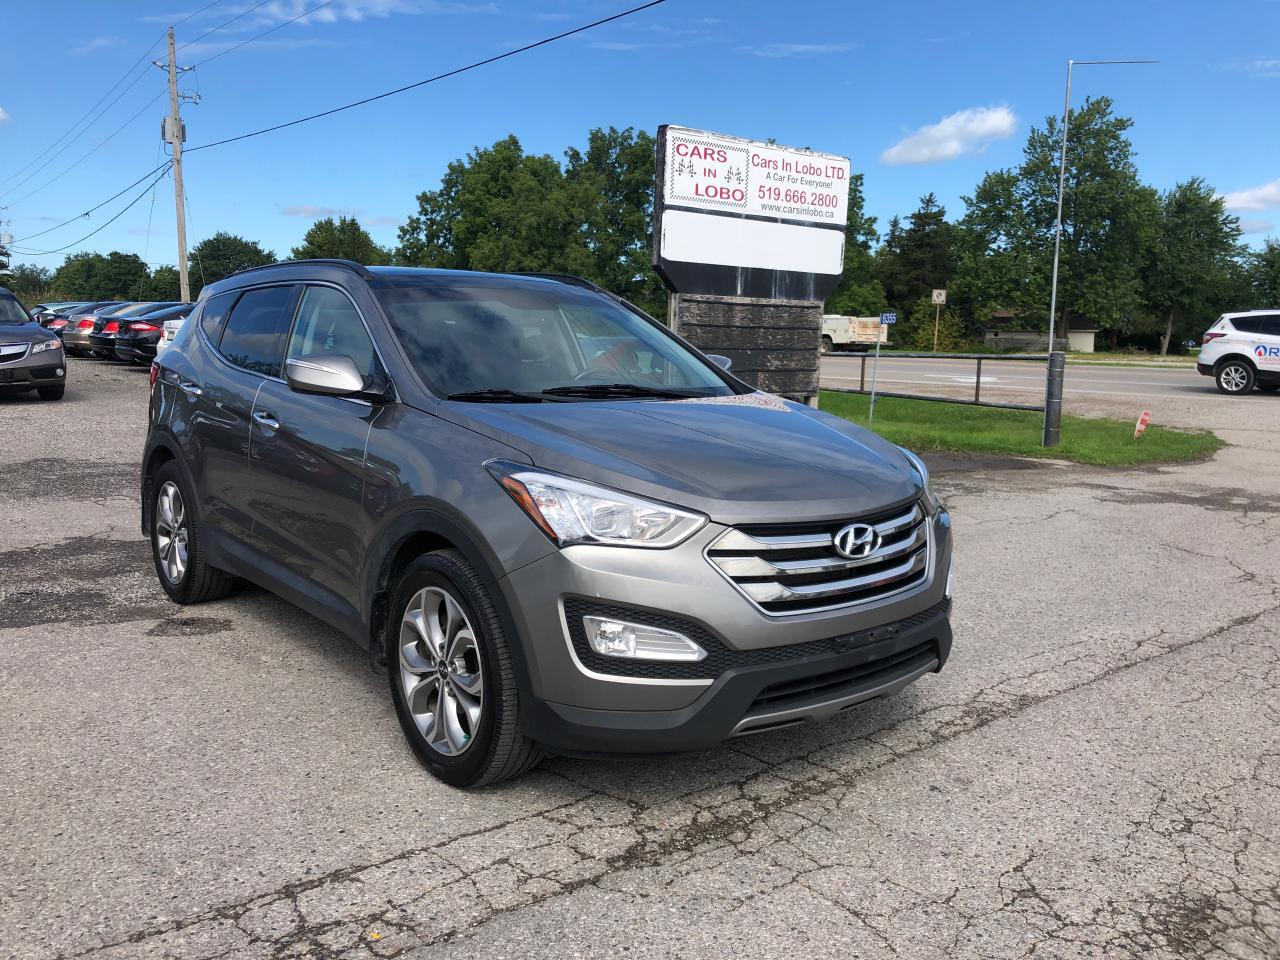 2016 Hyundai Santa Fe Sport Limited Adventure Edition